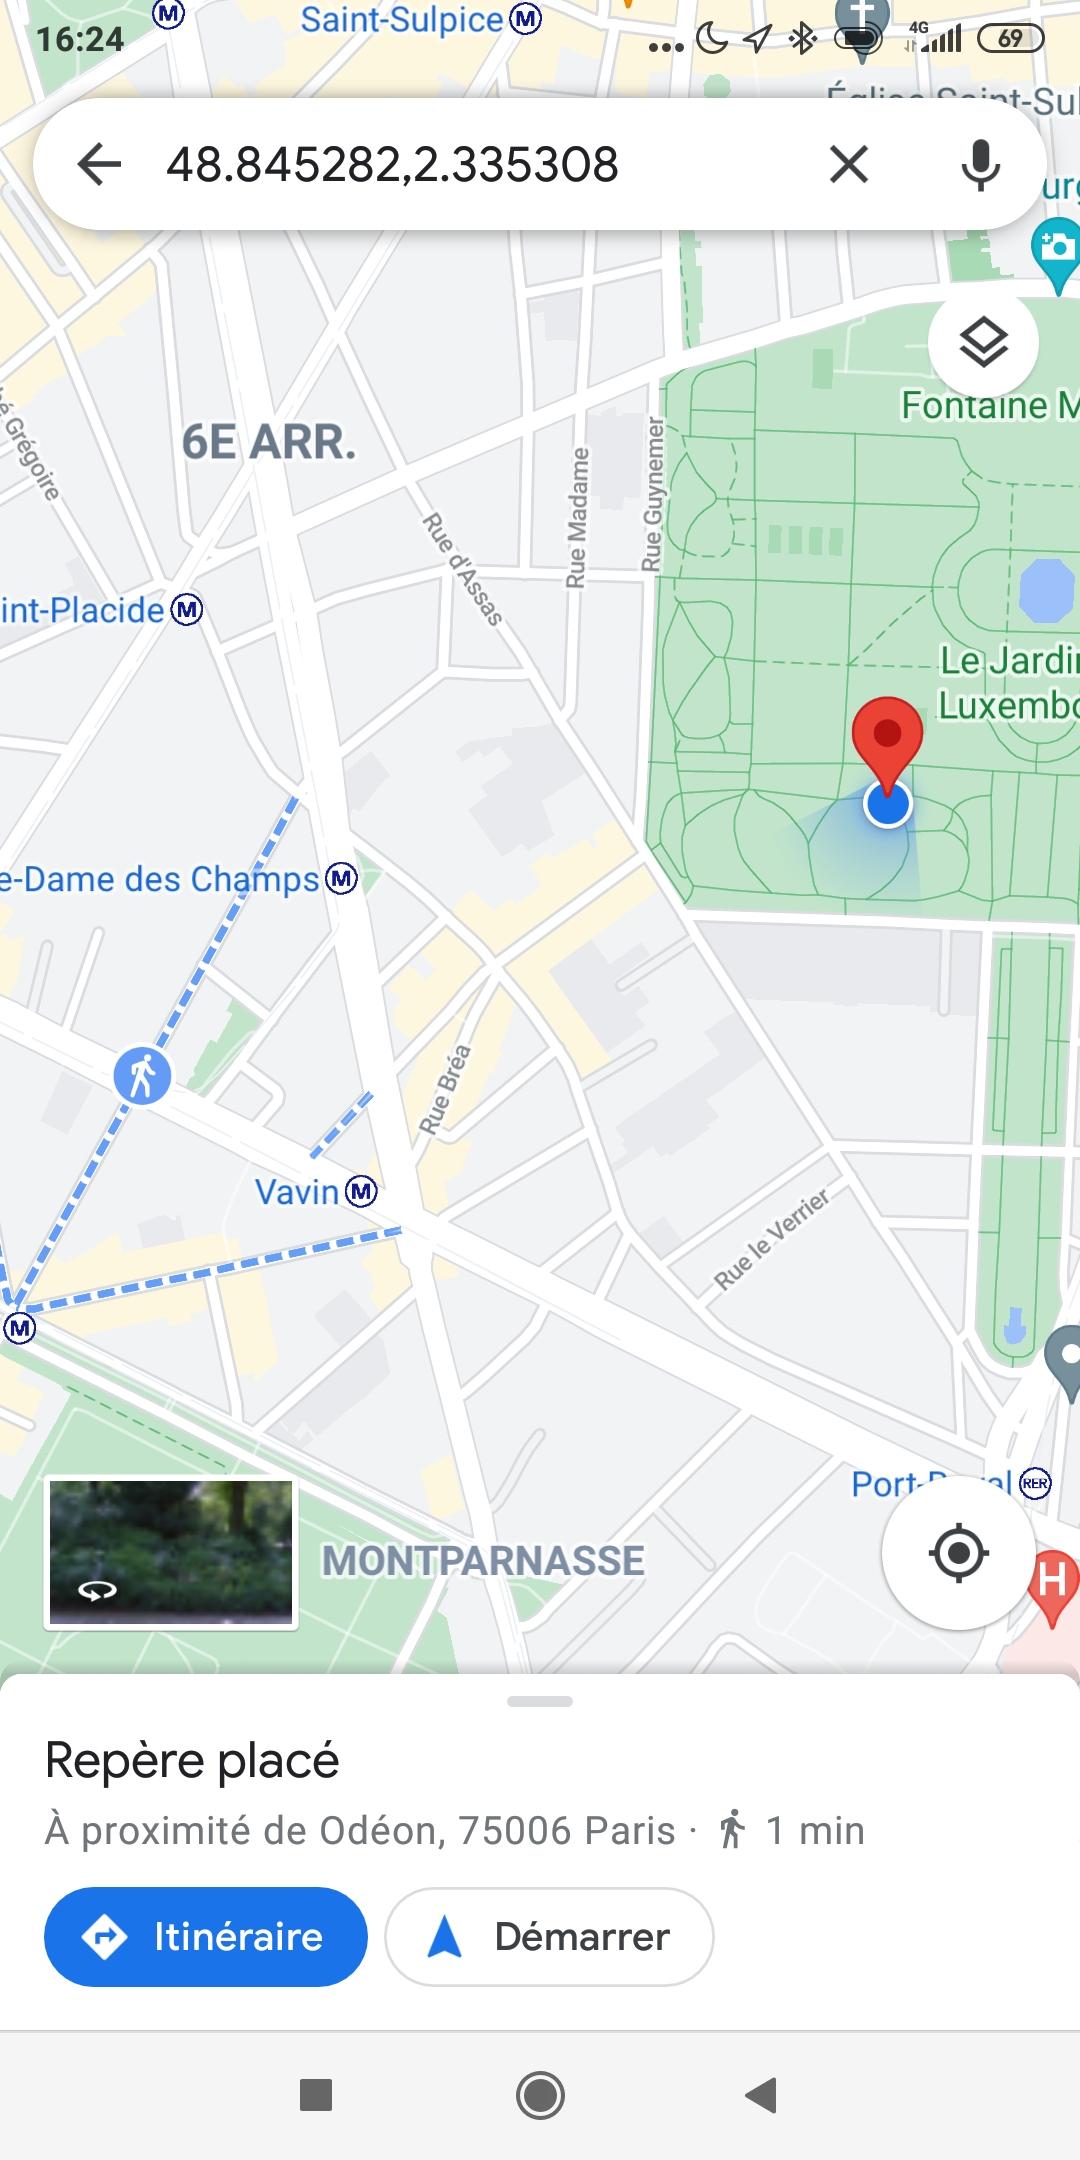 PIQUE-NIQUE - Jeudi 10 juin 16h - Jardin du Luxembourg Screenshot-2021-06-10-16-24-26-735-com-google-android-apps-maps